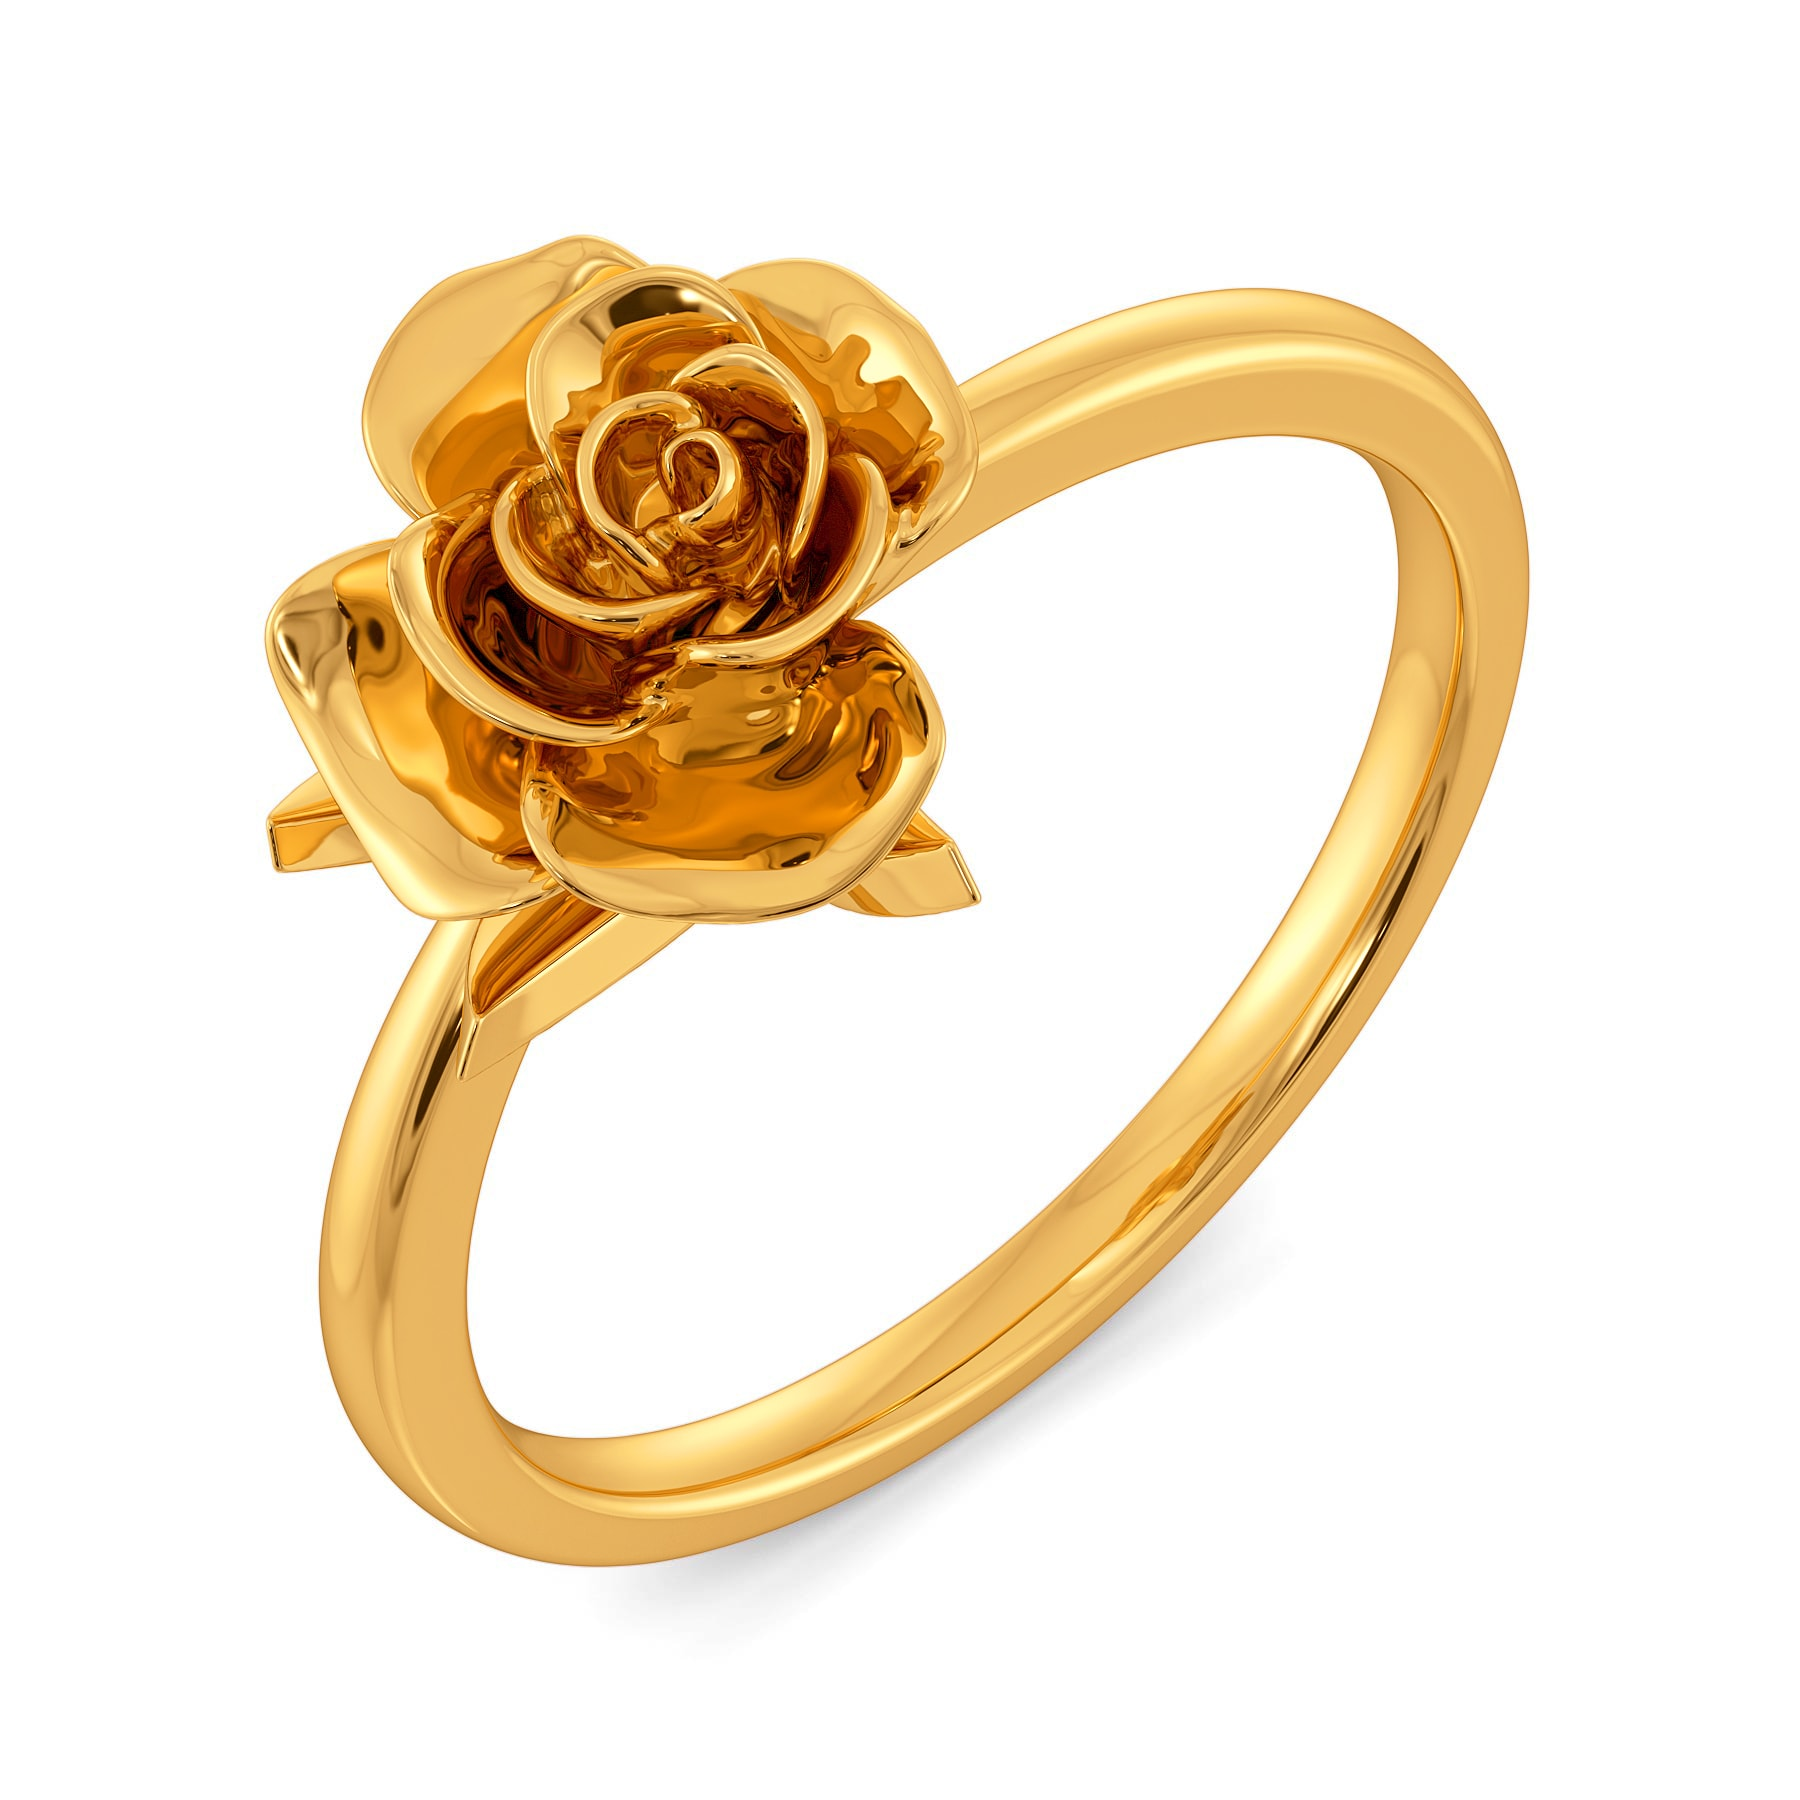 Buy Aphrodite Rose Gold Rings @ Melorra.com